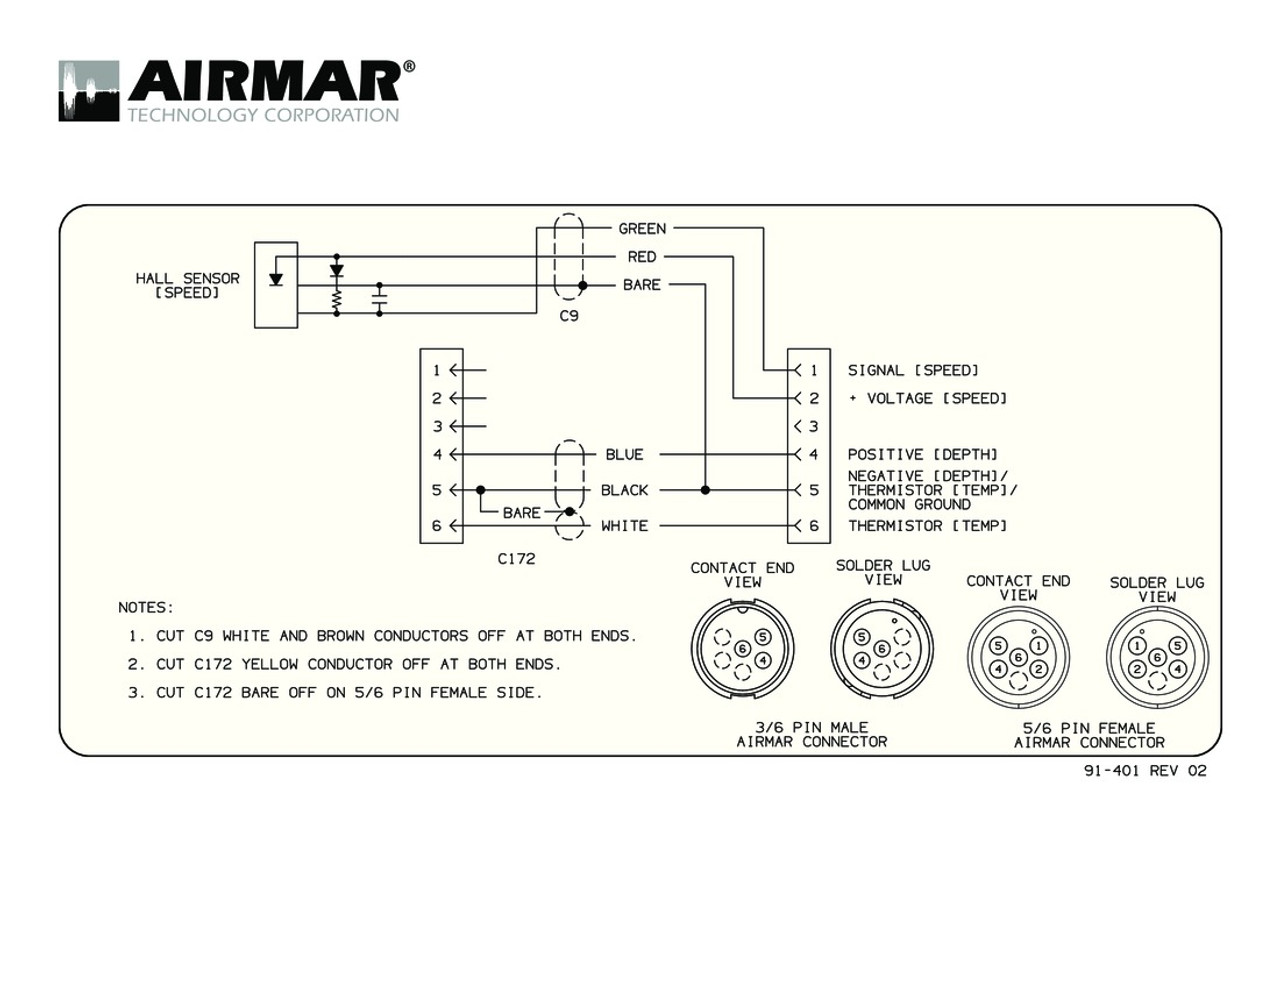 6 Pin Male Plug Wiring Diagram - DIY Enthusiasts Wiring Diagrams •